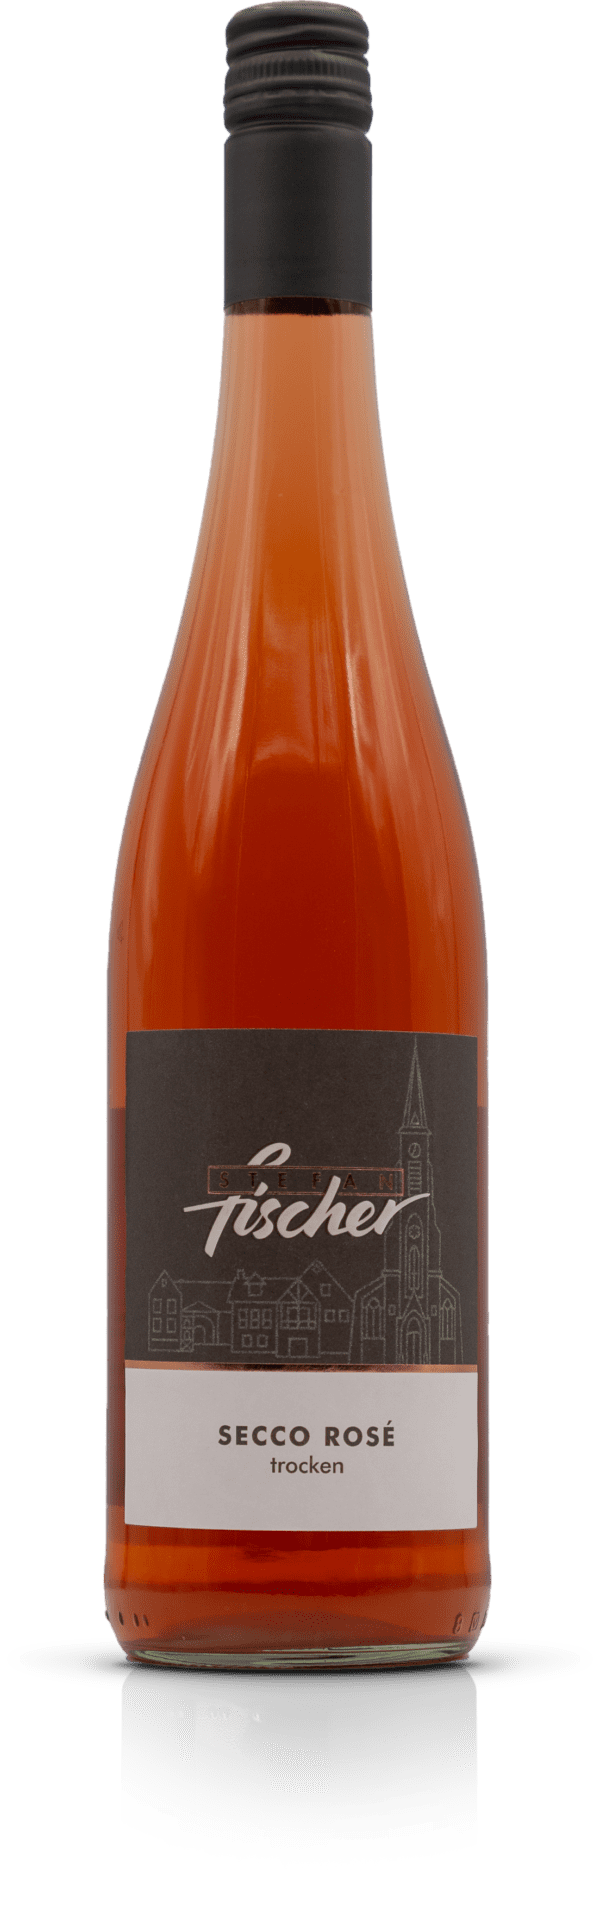 Weingut Stefan Fischer SECCO ROSÉ trocken